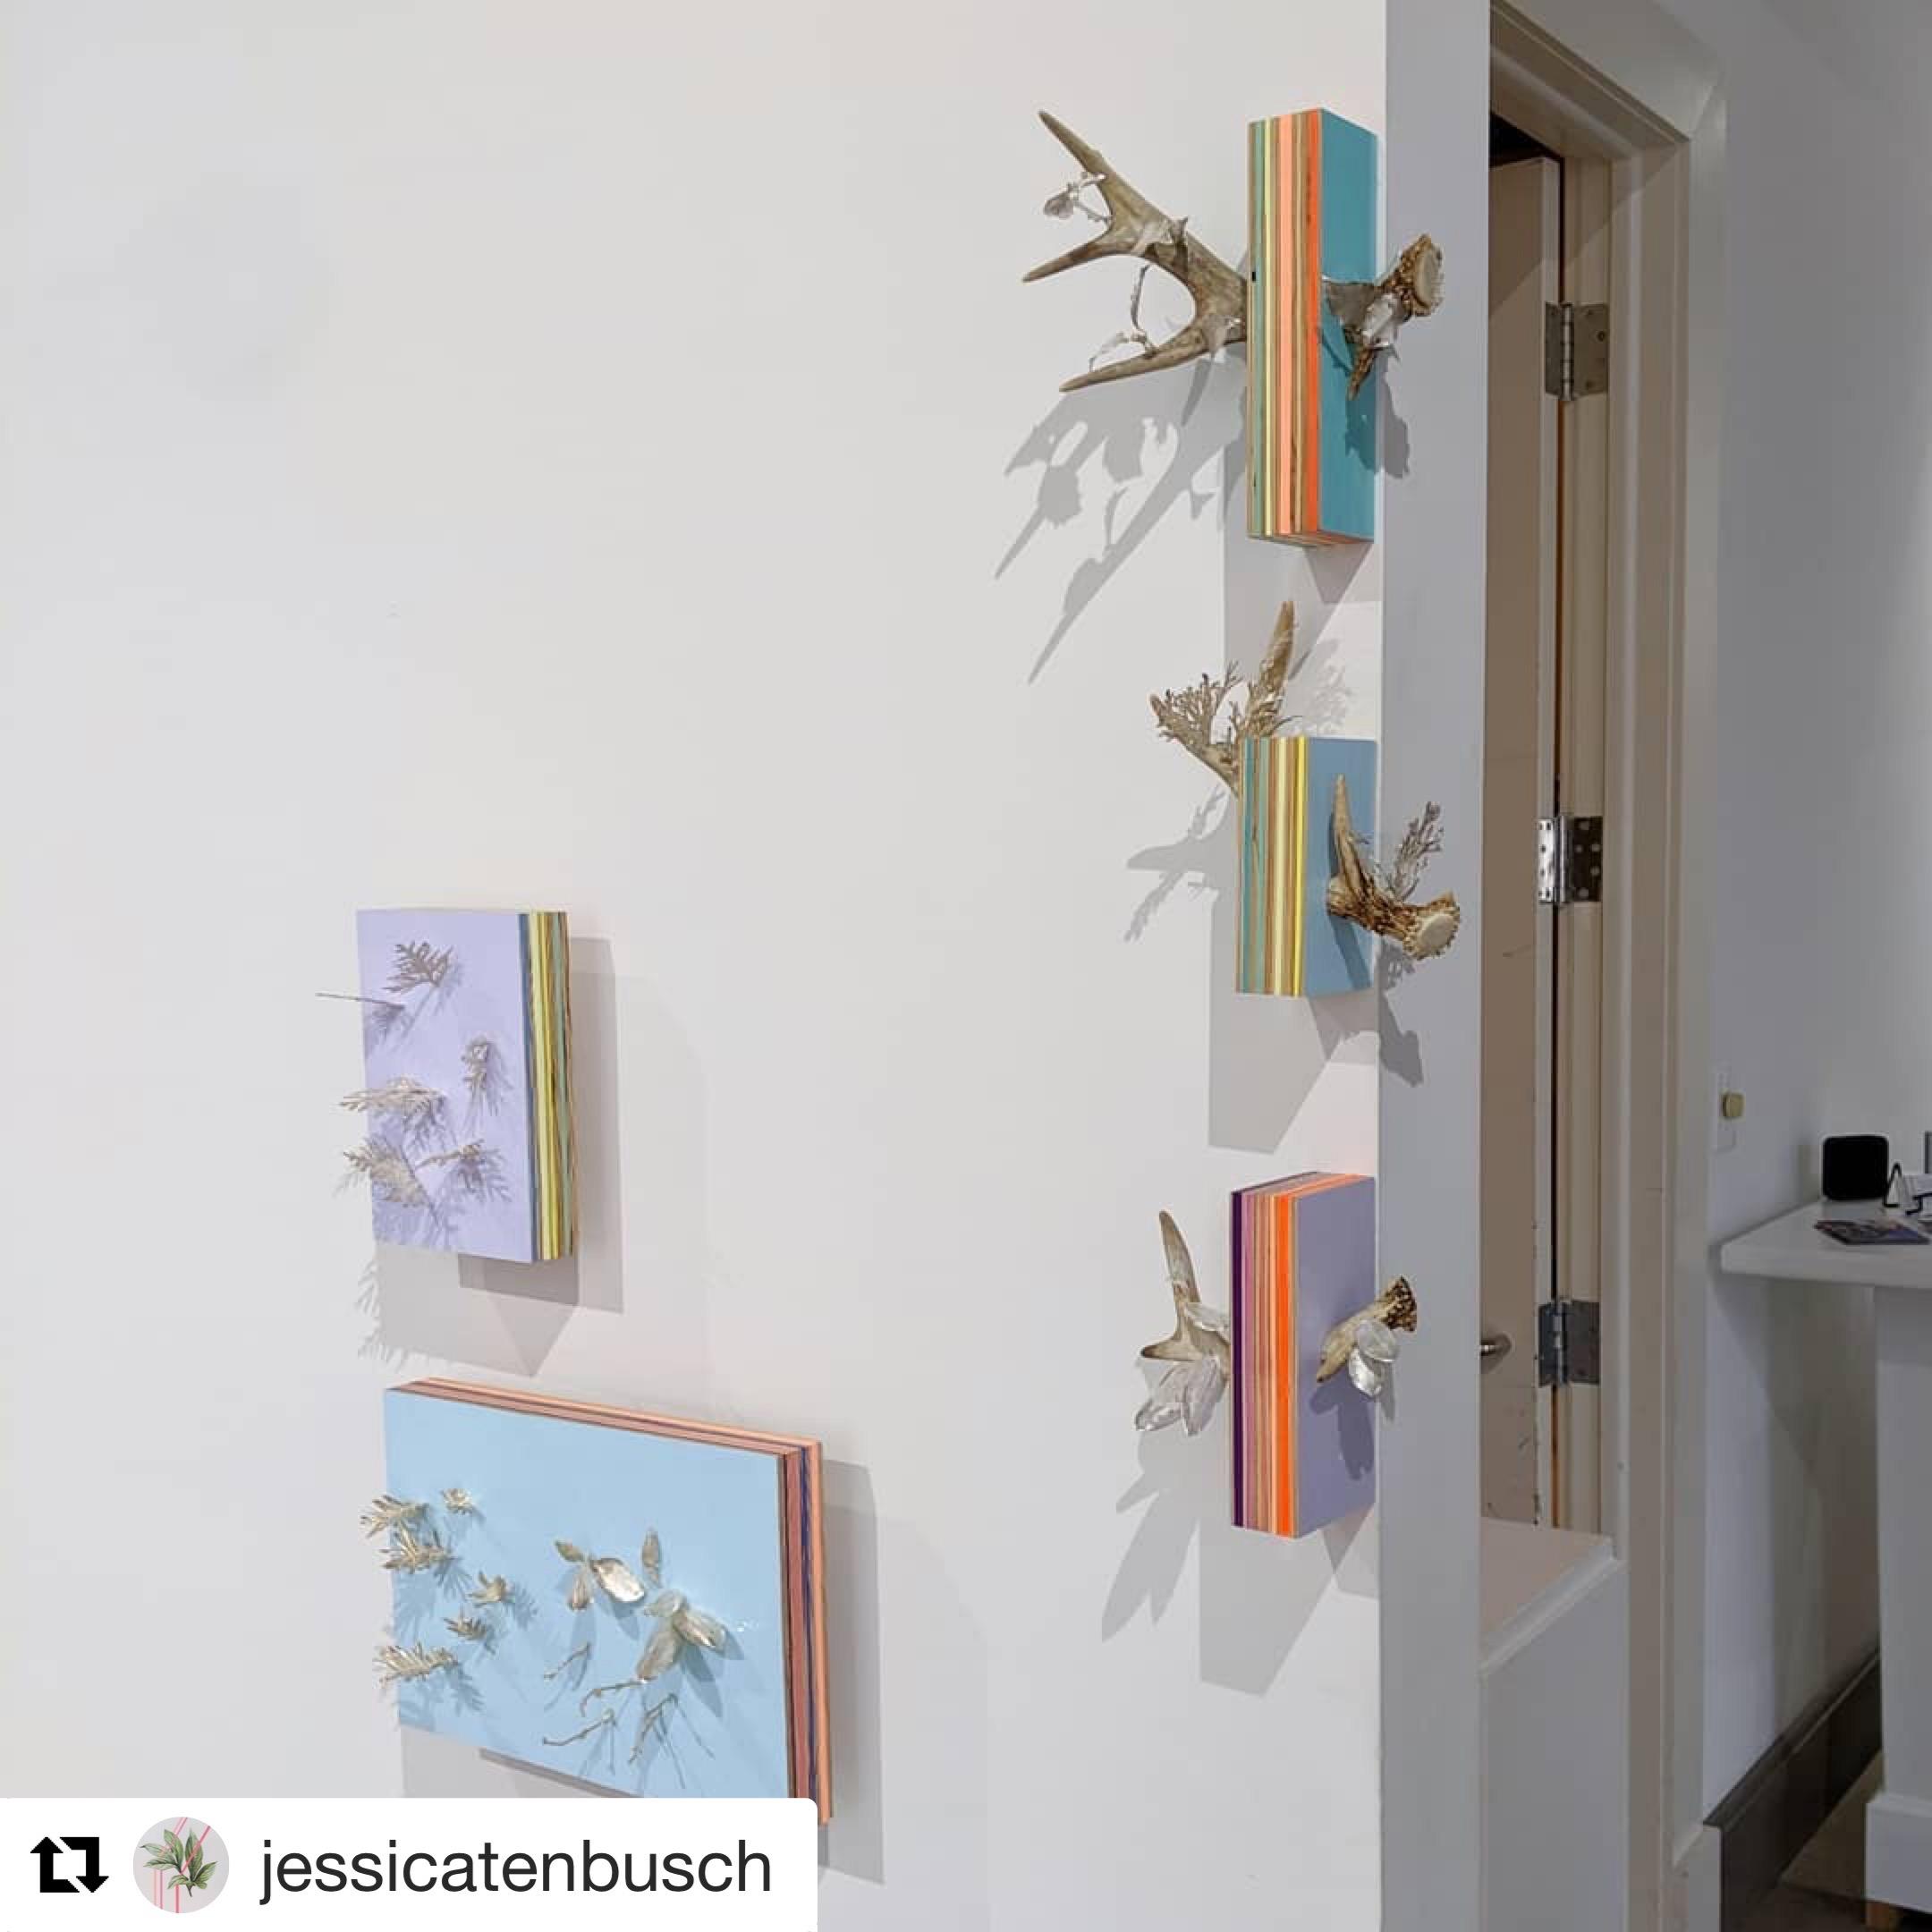 Jessica Tenbusch